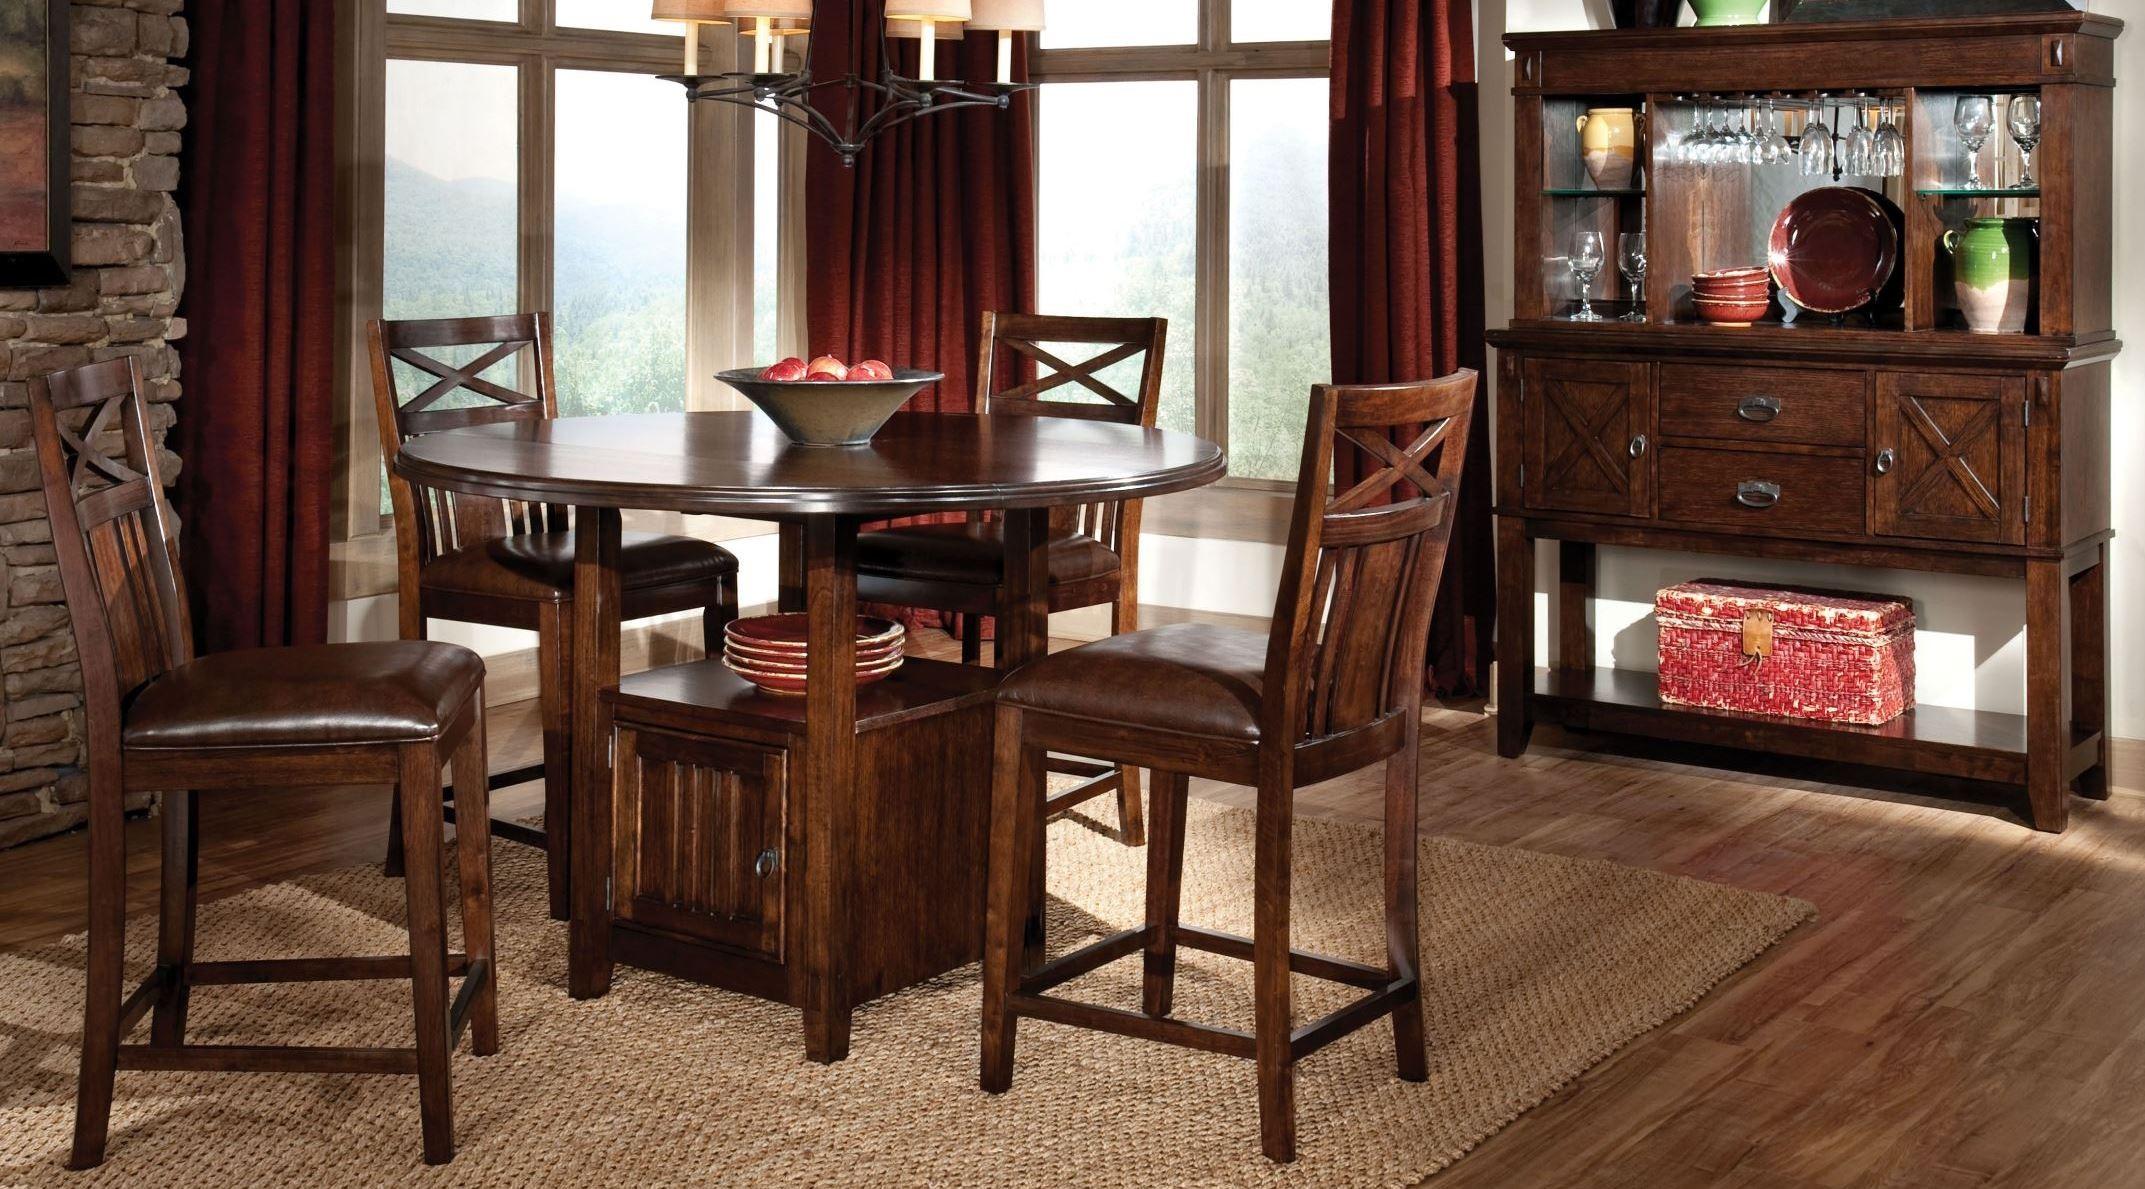 Sonoma Warm Medium Oak Round Drop Leaf Counter Dining Room